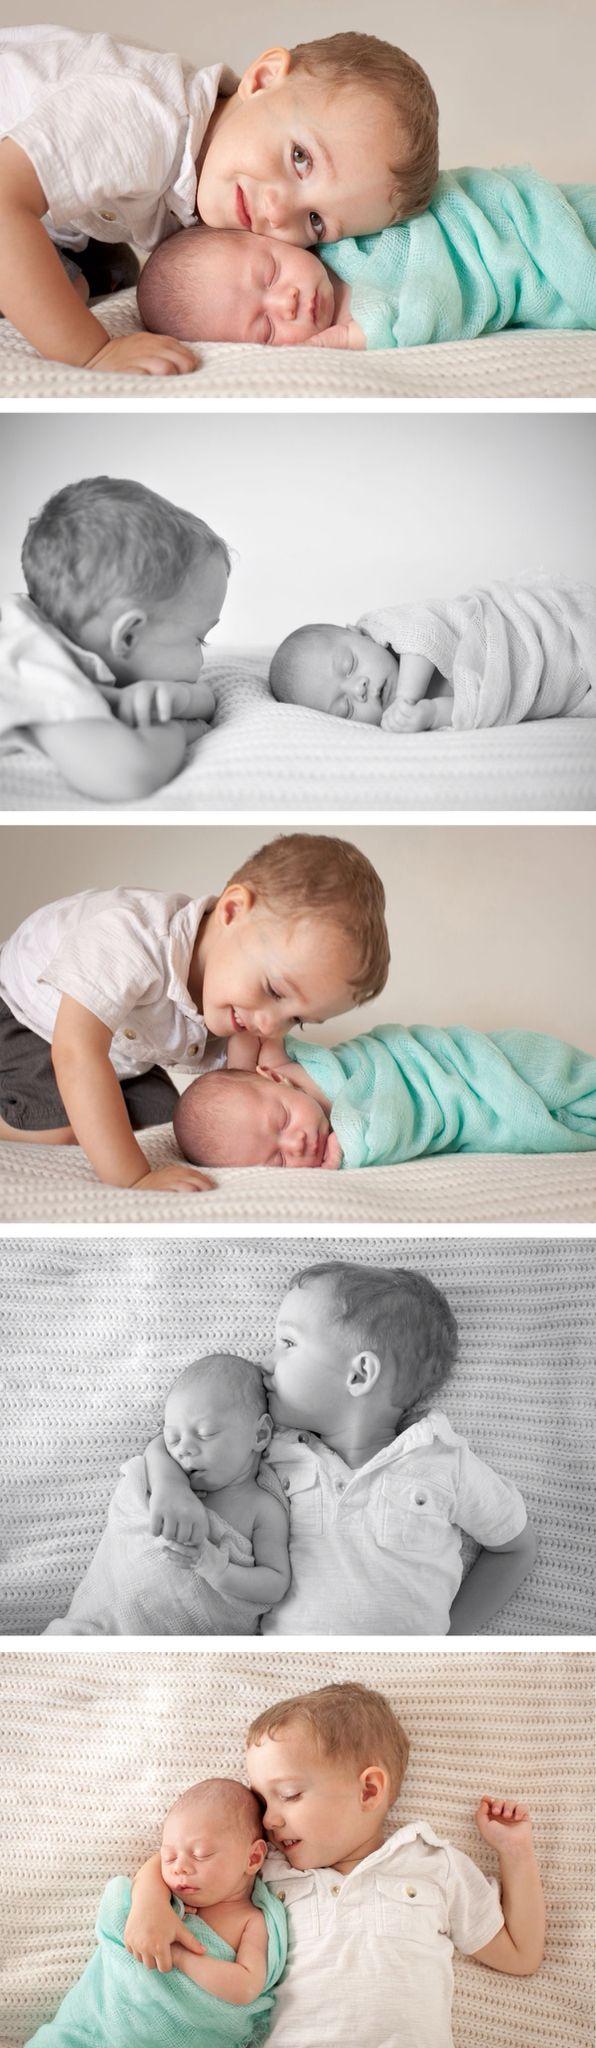 Newborn + irmão https://www.amazon.co.uk/Baby-Car-Mirror-Shatterproof-Installation/dp/B06XHG6SSY